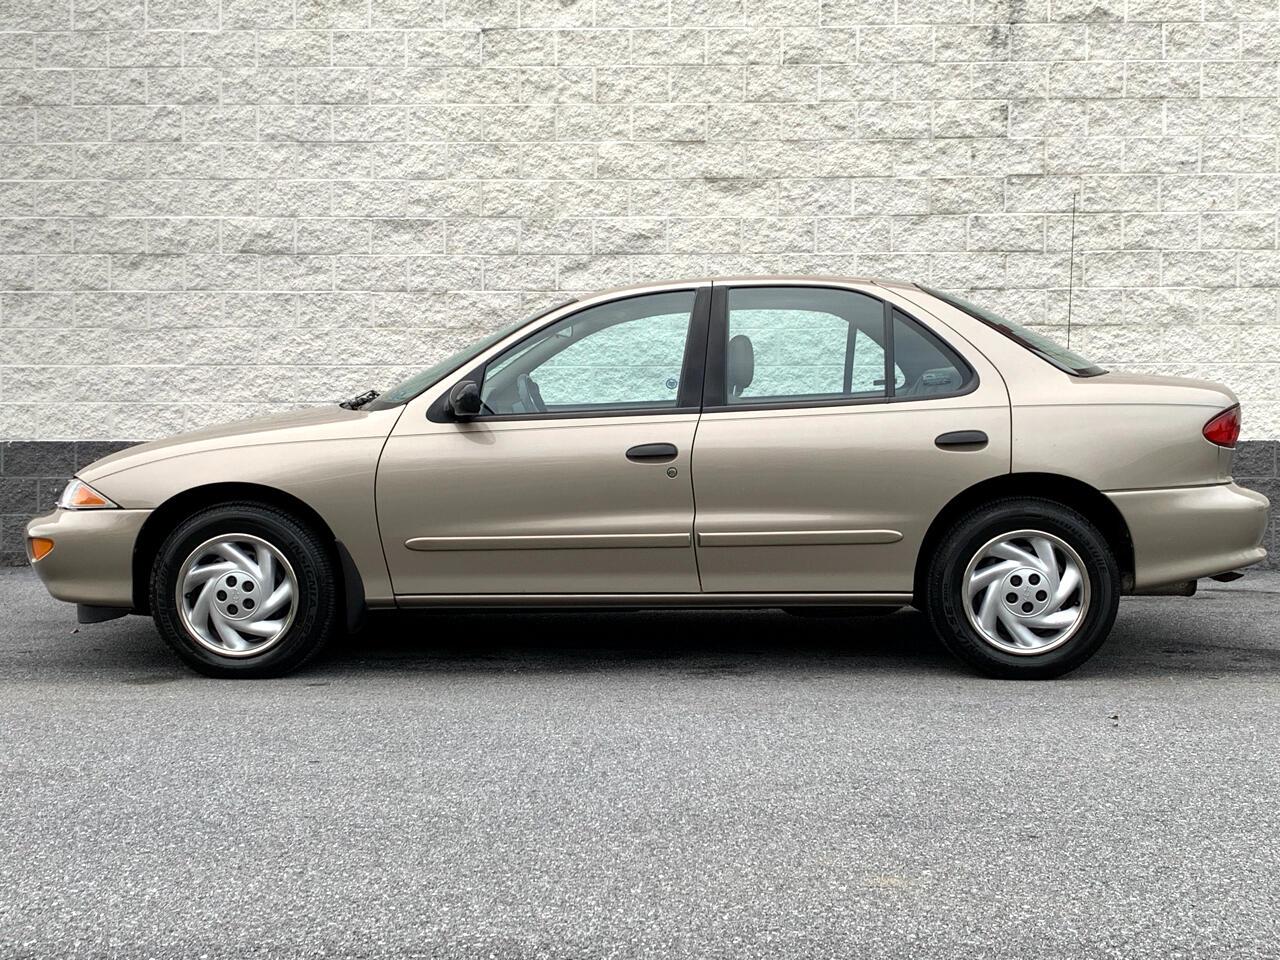 1997 Chevrolet Cavalier 4dr Sdn